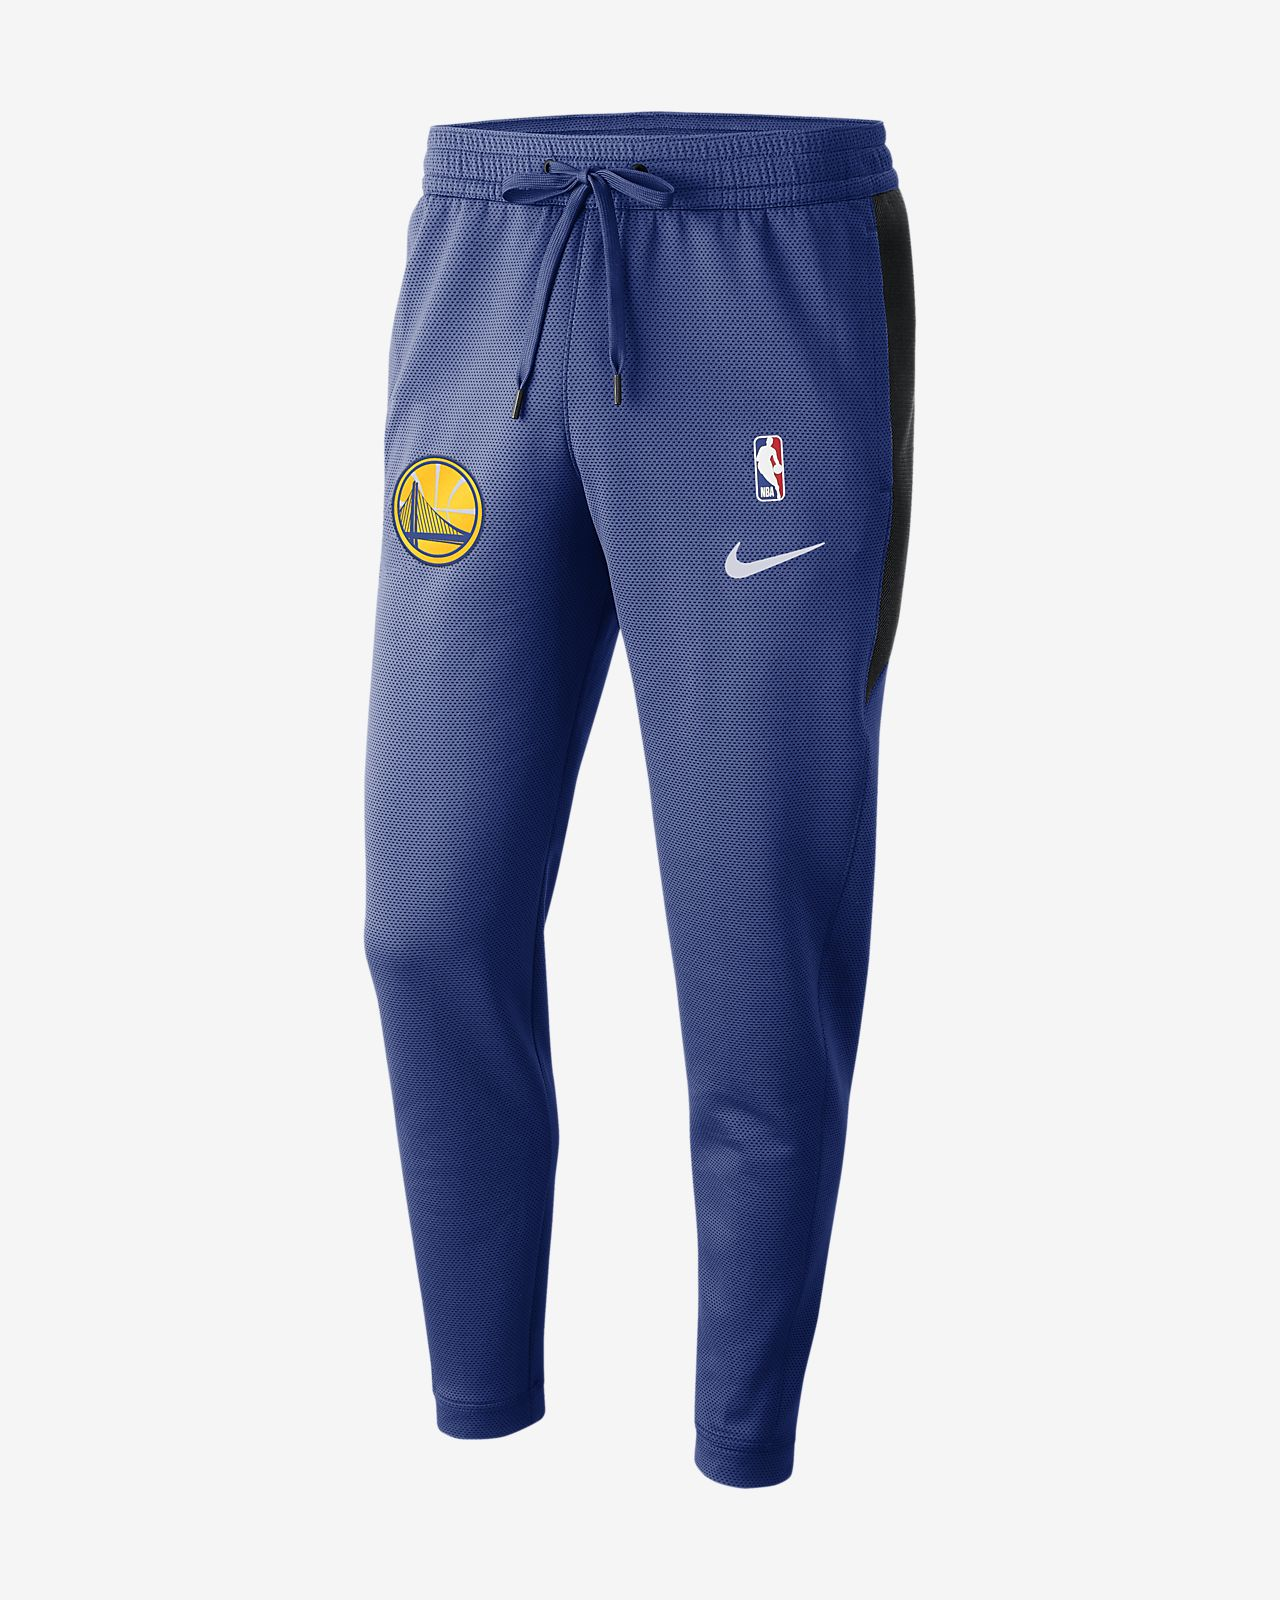 Pantaloni Golden State Warriors Nike Therma Flex Showtime NBA - Uomo